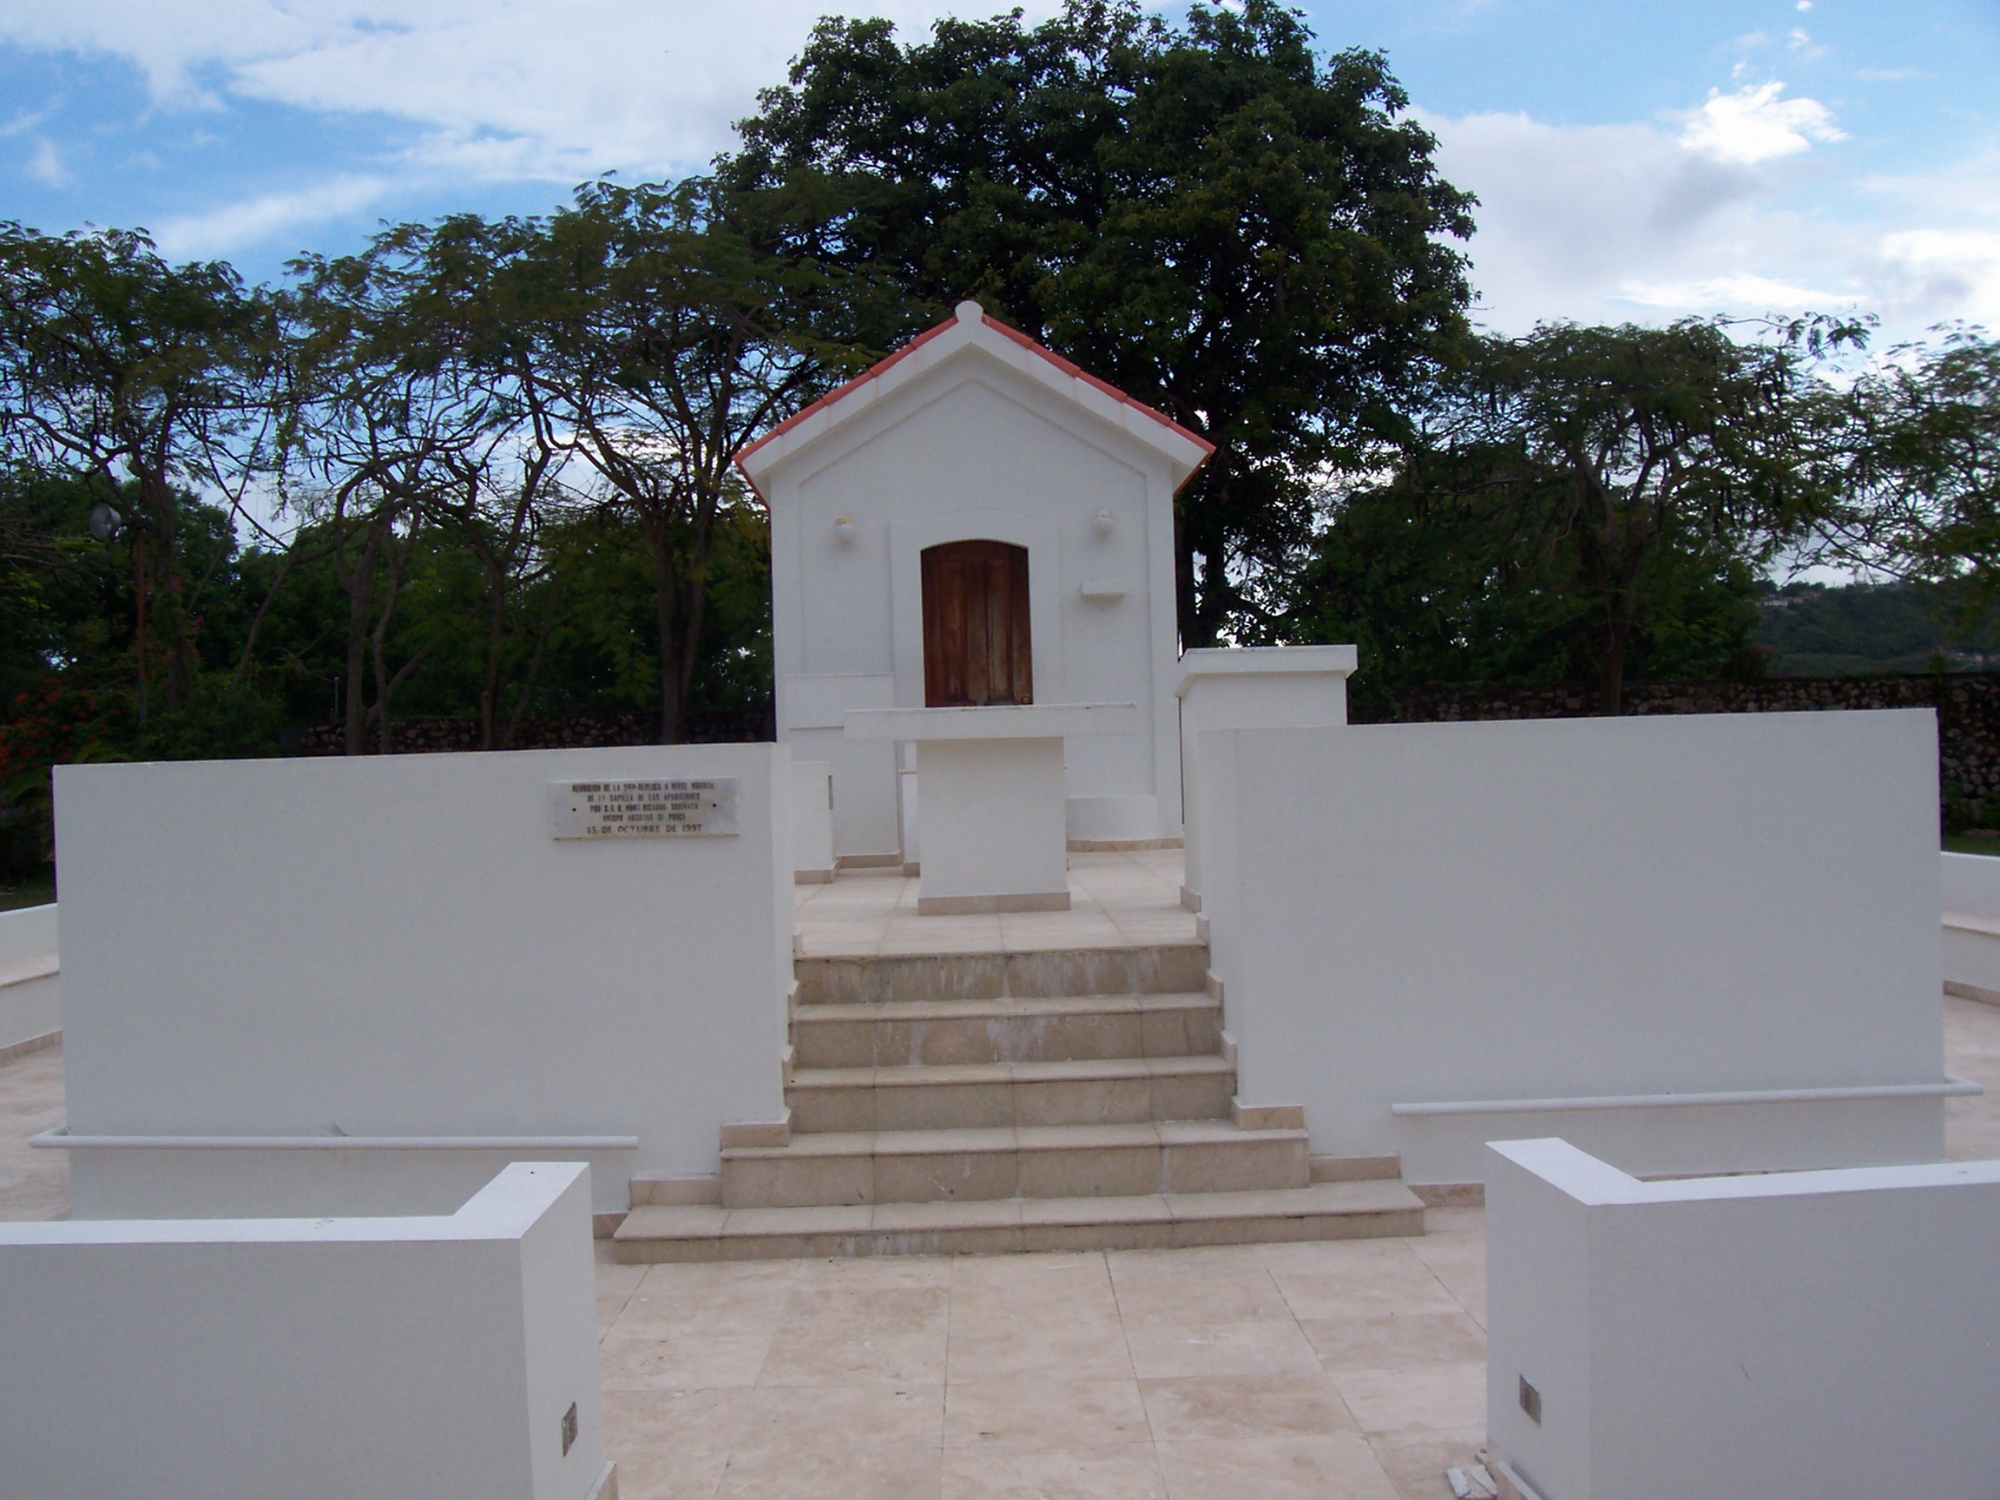 Réplica Capilla de Apariciones de Fátima